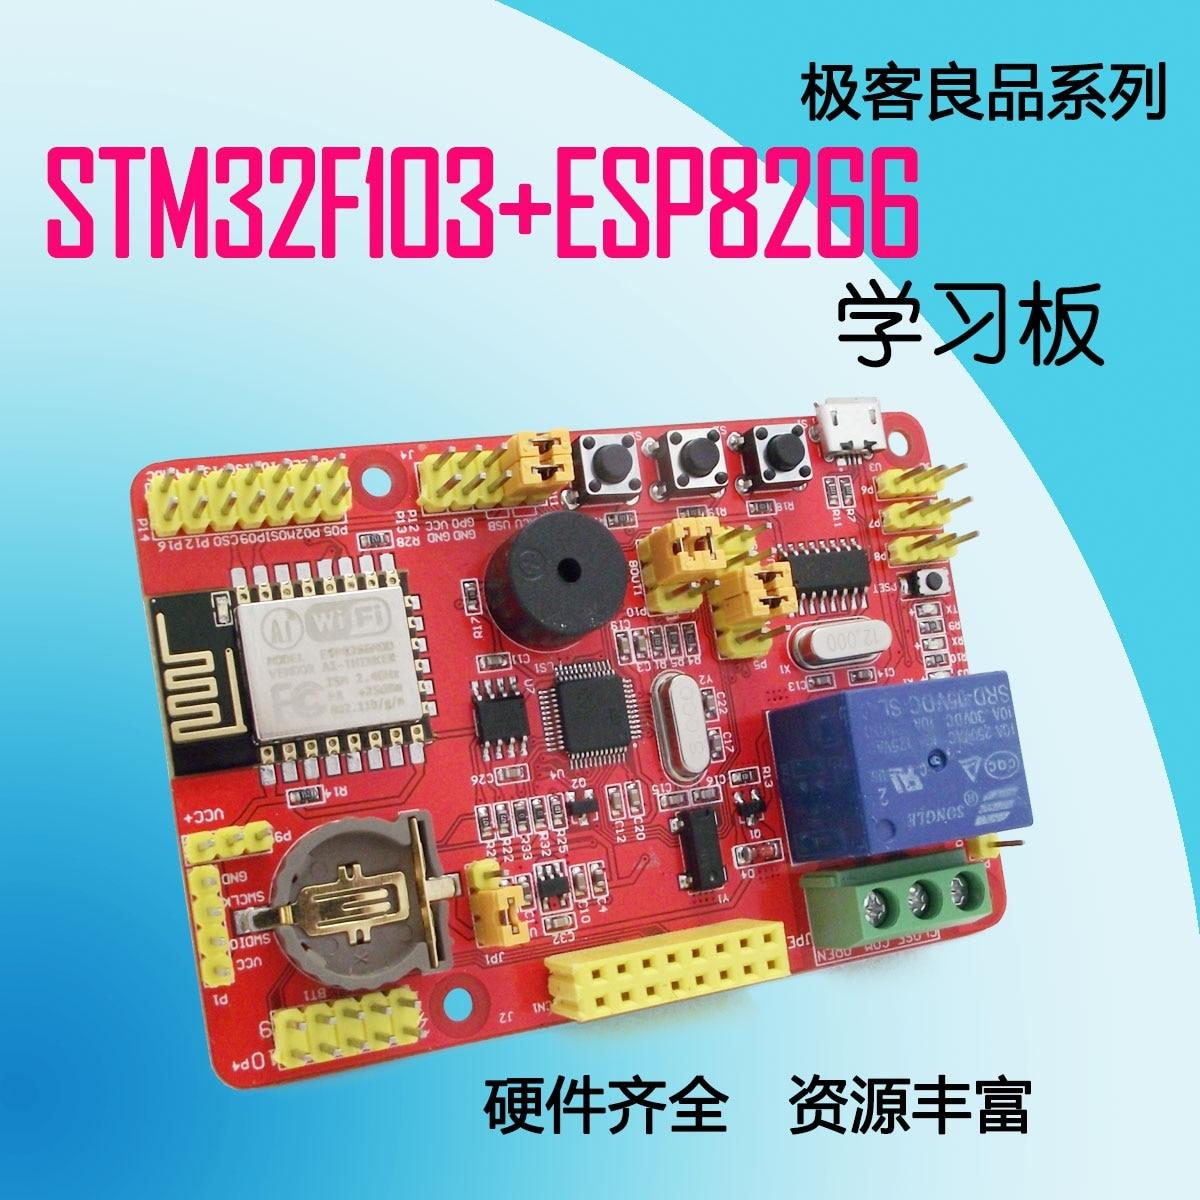 STM32F103C8+ESP8266 Learning Board Evaluation Board Introduction Artifact STM32<br>